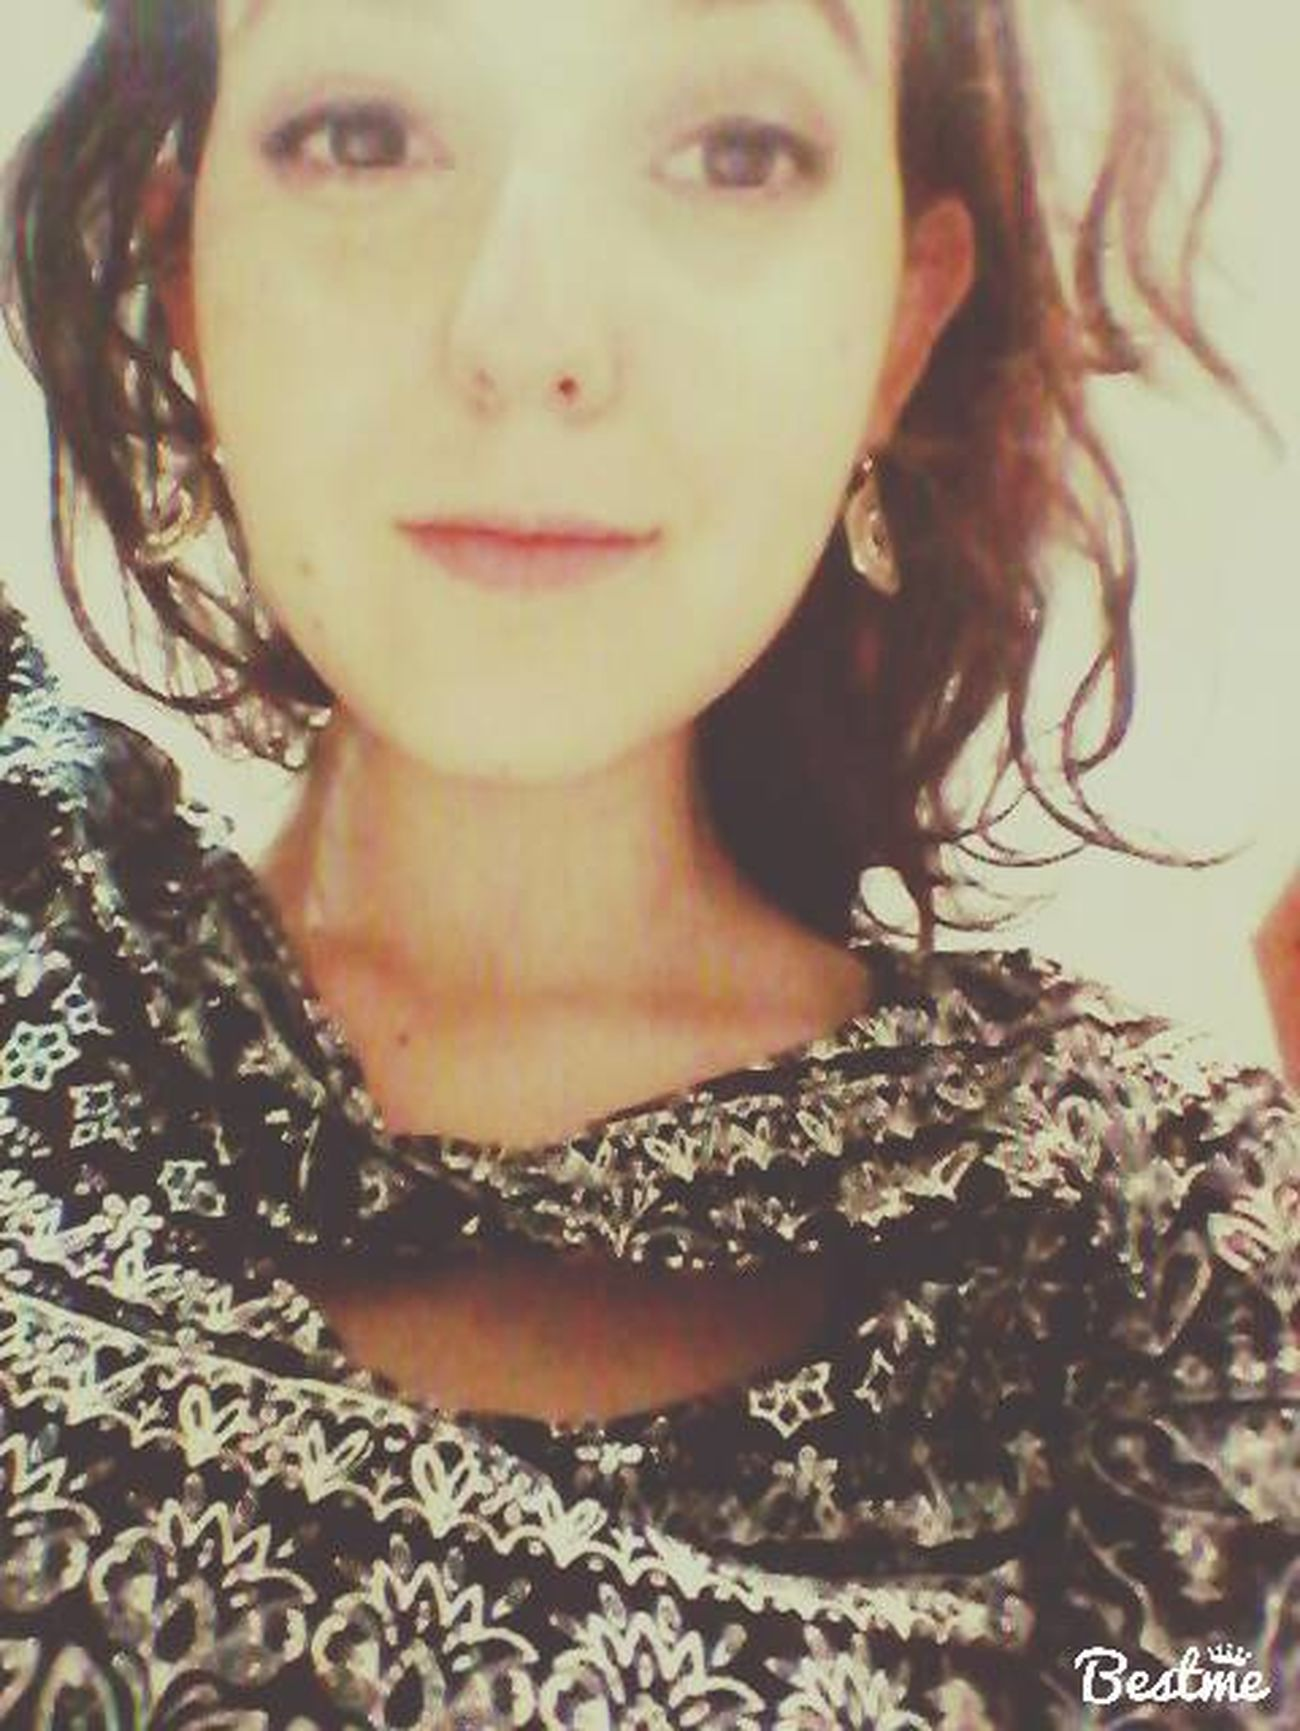 Relaxing Taking Photos Hi! That's Me Elegance, Eyes Look Sweet Smile Happiness Lips Enjoying Life Latingirl Brown Eyes Russian Girl Brown Hair Sexyness Cateyes Sexygirl Sexylook Sexylips Italiangirl Sexyeye European Girl Makeup